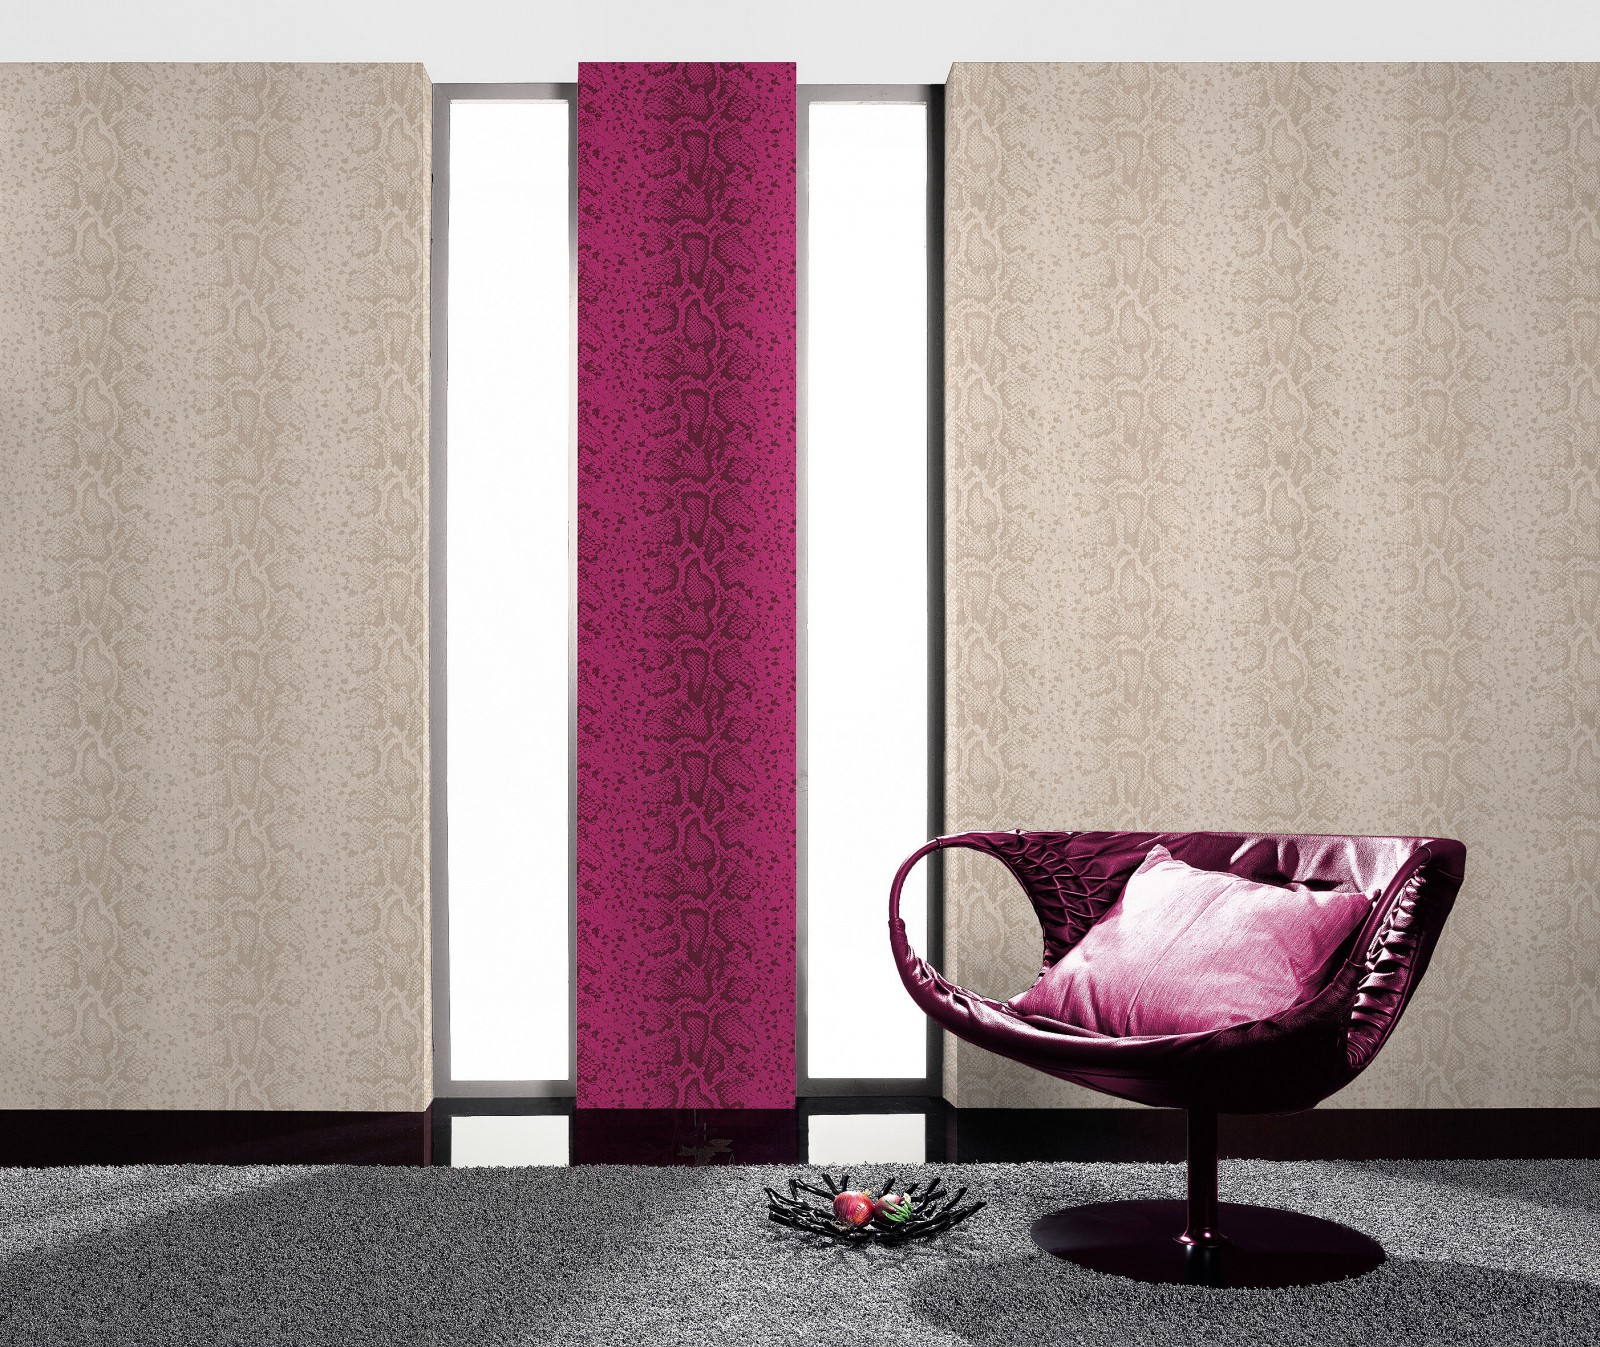 tapete rasch bestseller schlangenhaut optik tapete 281002 pink lila glitzer. Black Bedroom Furniture Sets. Home Design Ideas